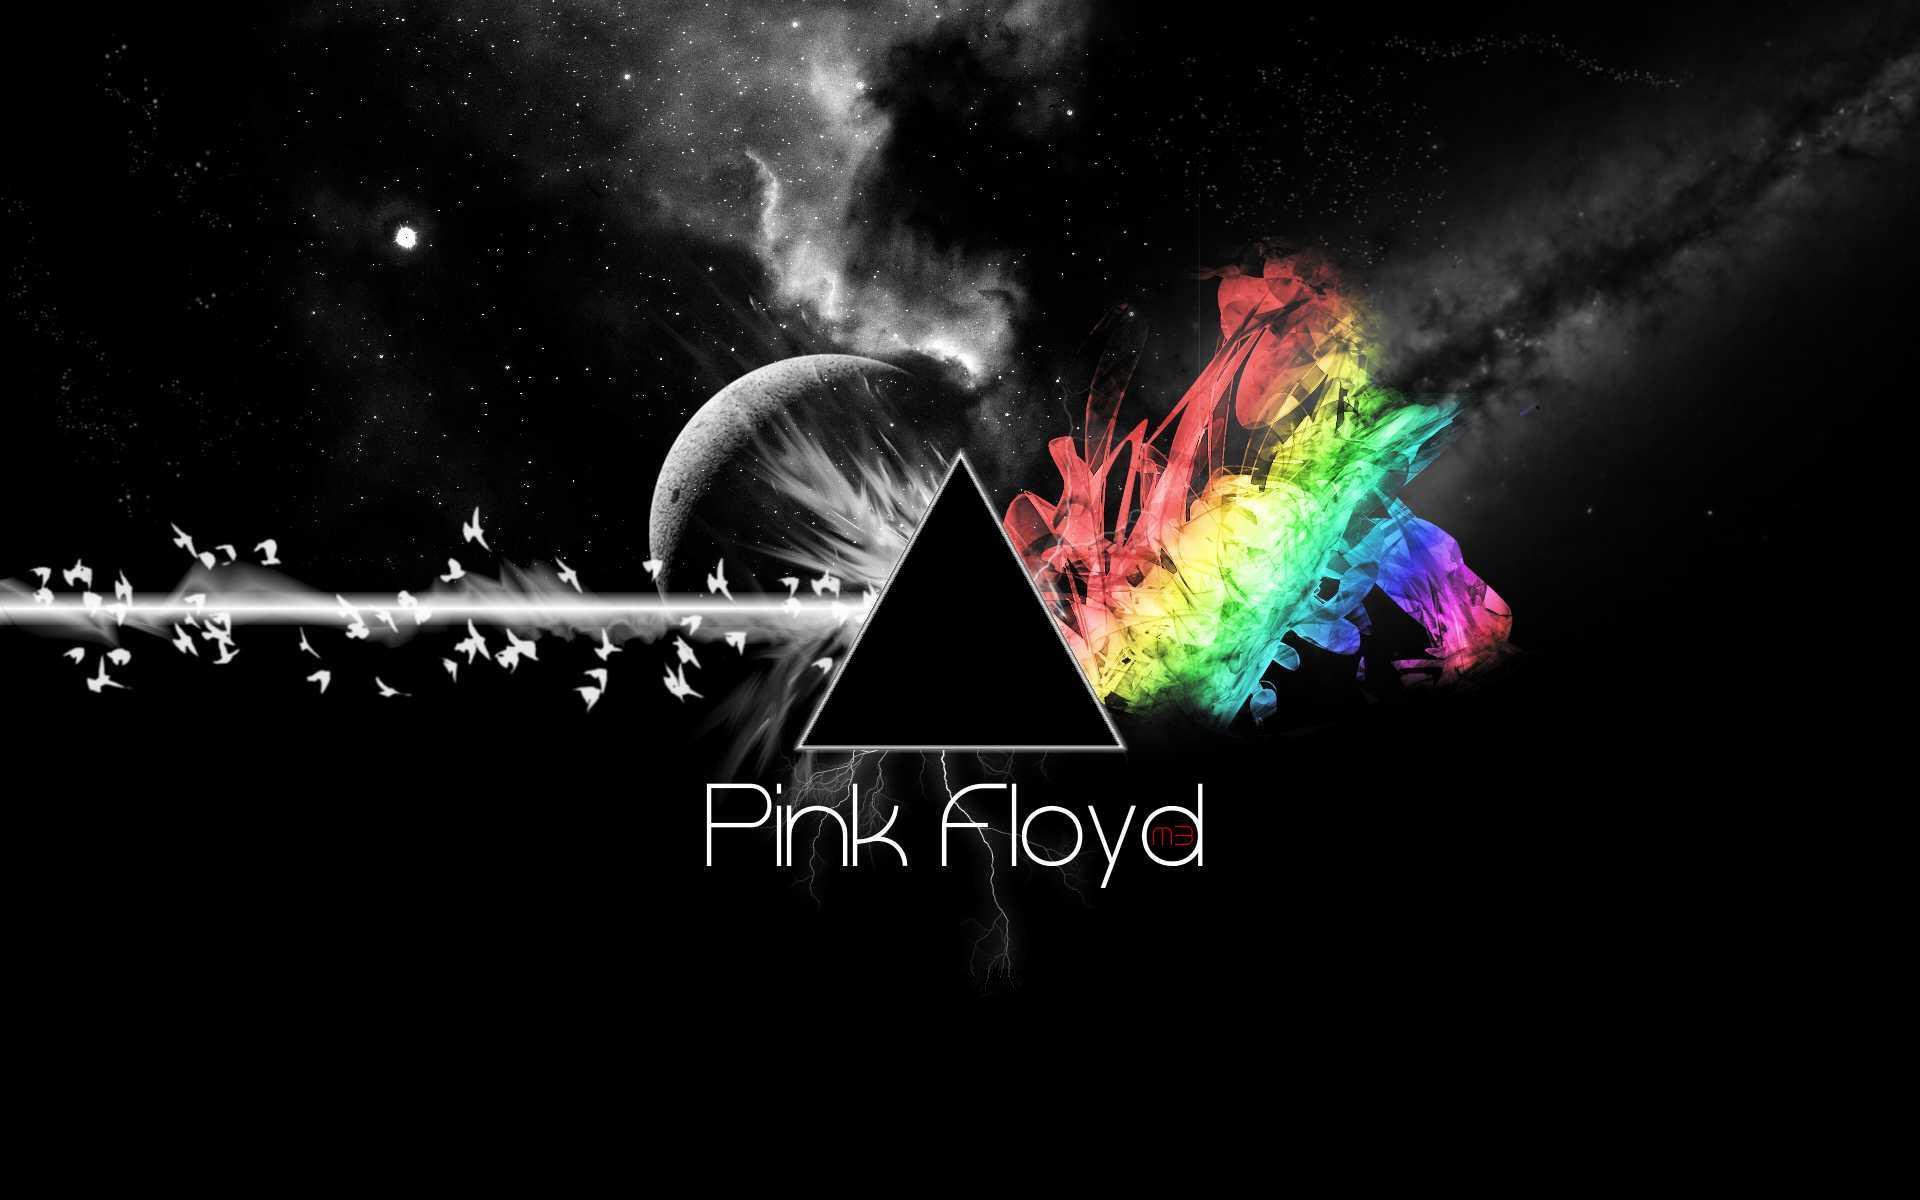 Free Pink Floyd Wallpaper 1920x1200 28685